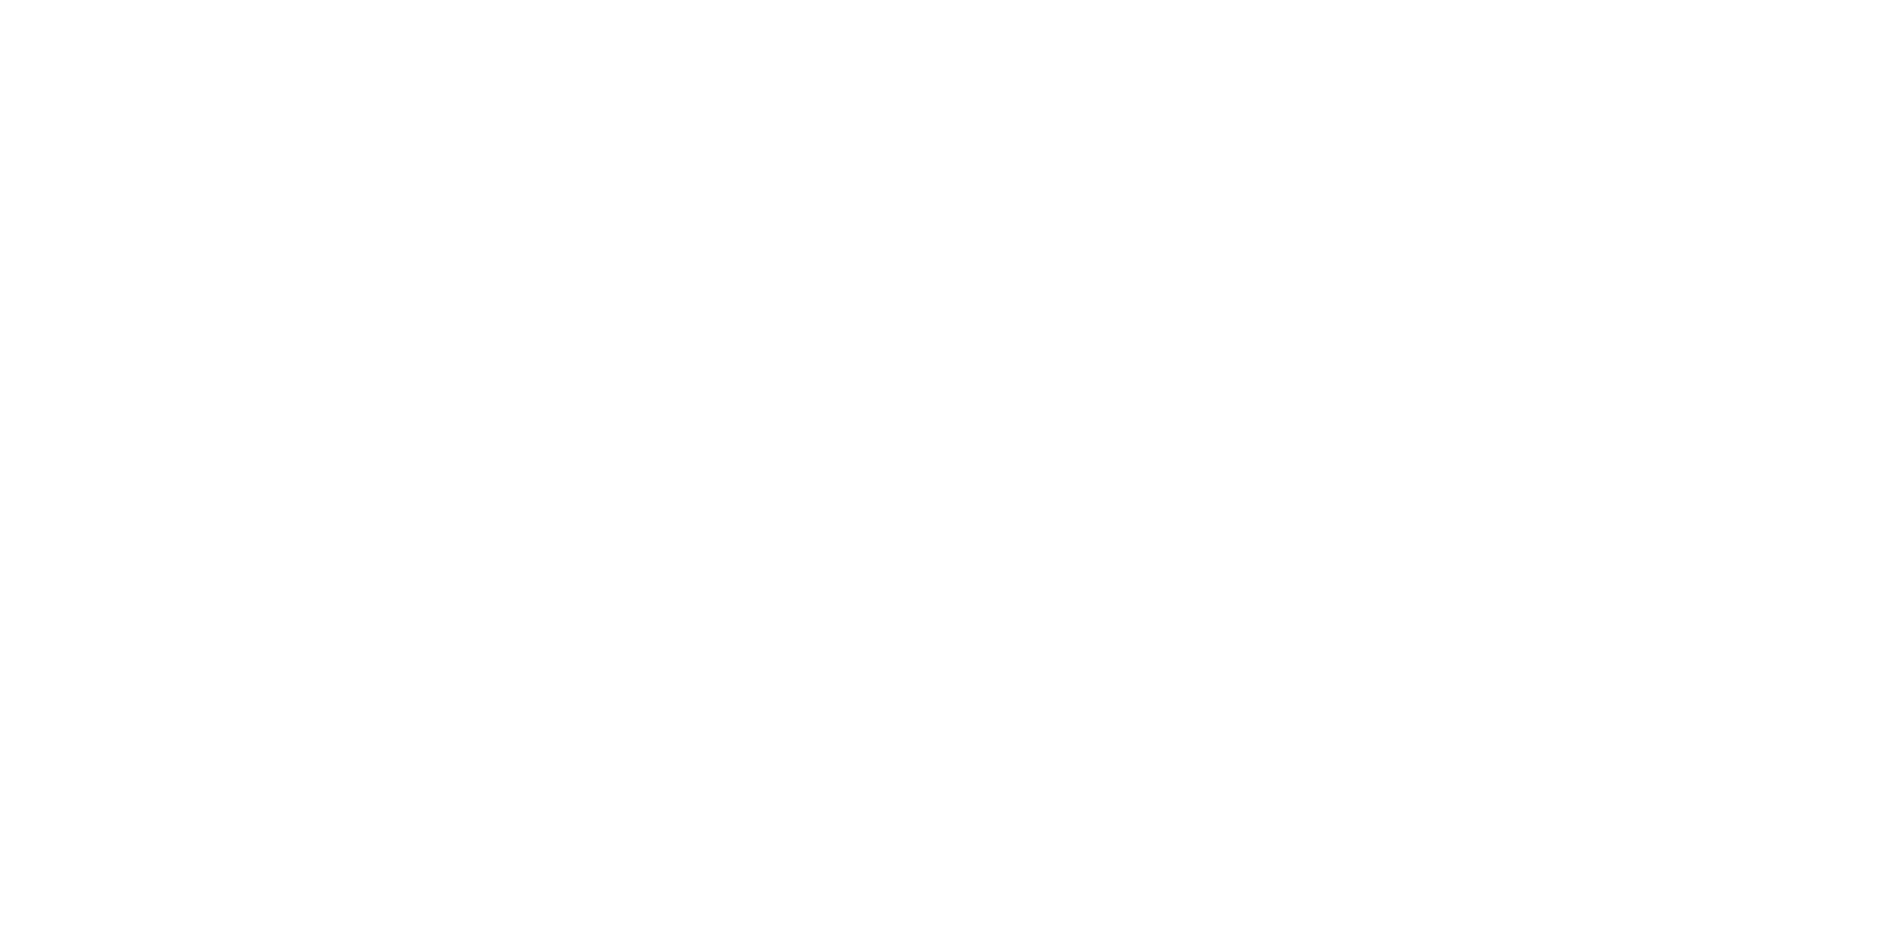 agencia de marketing online madrid